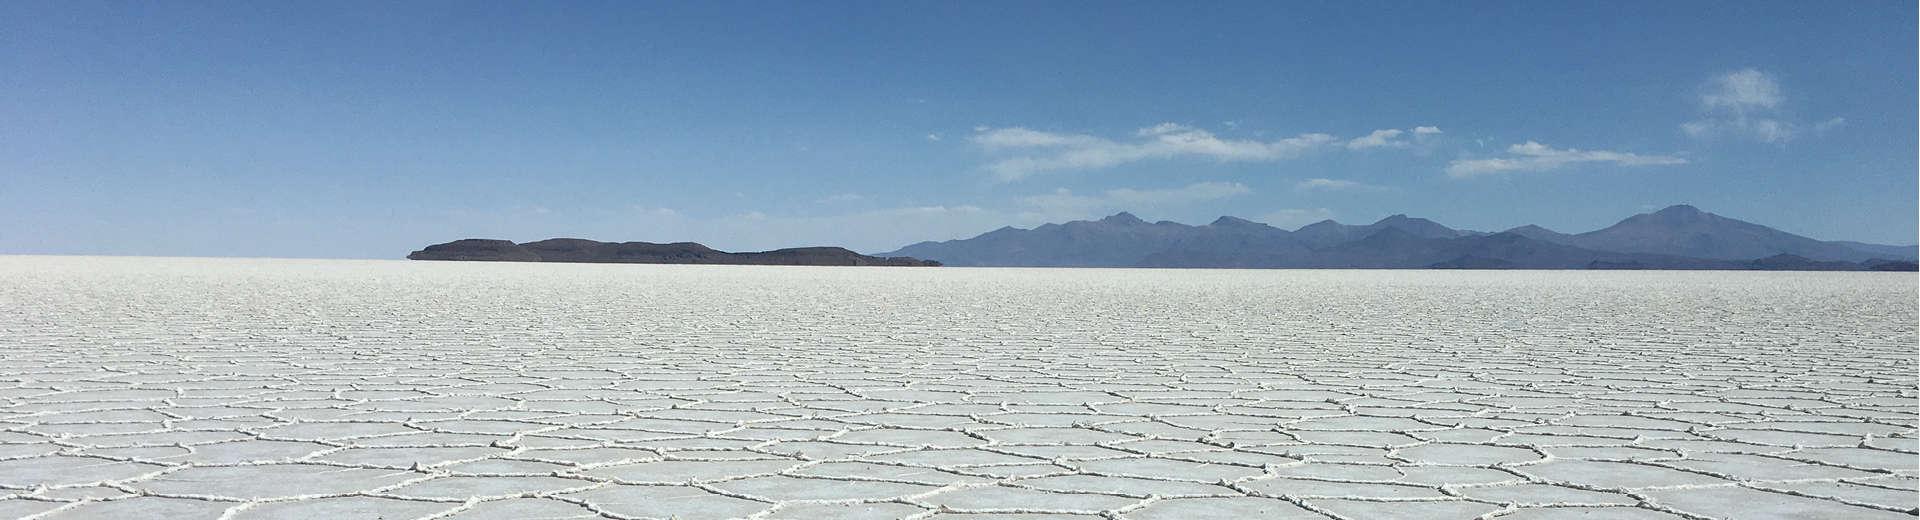 indagare insider journeys wonders of bolivia salt flats